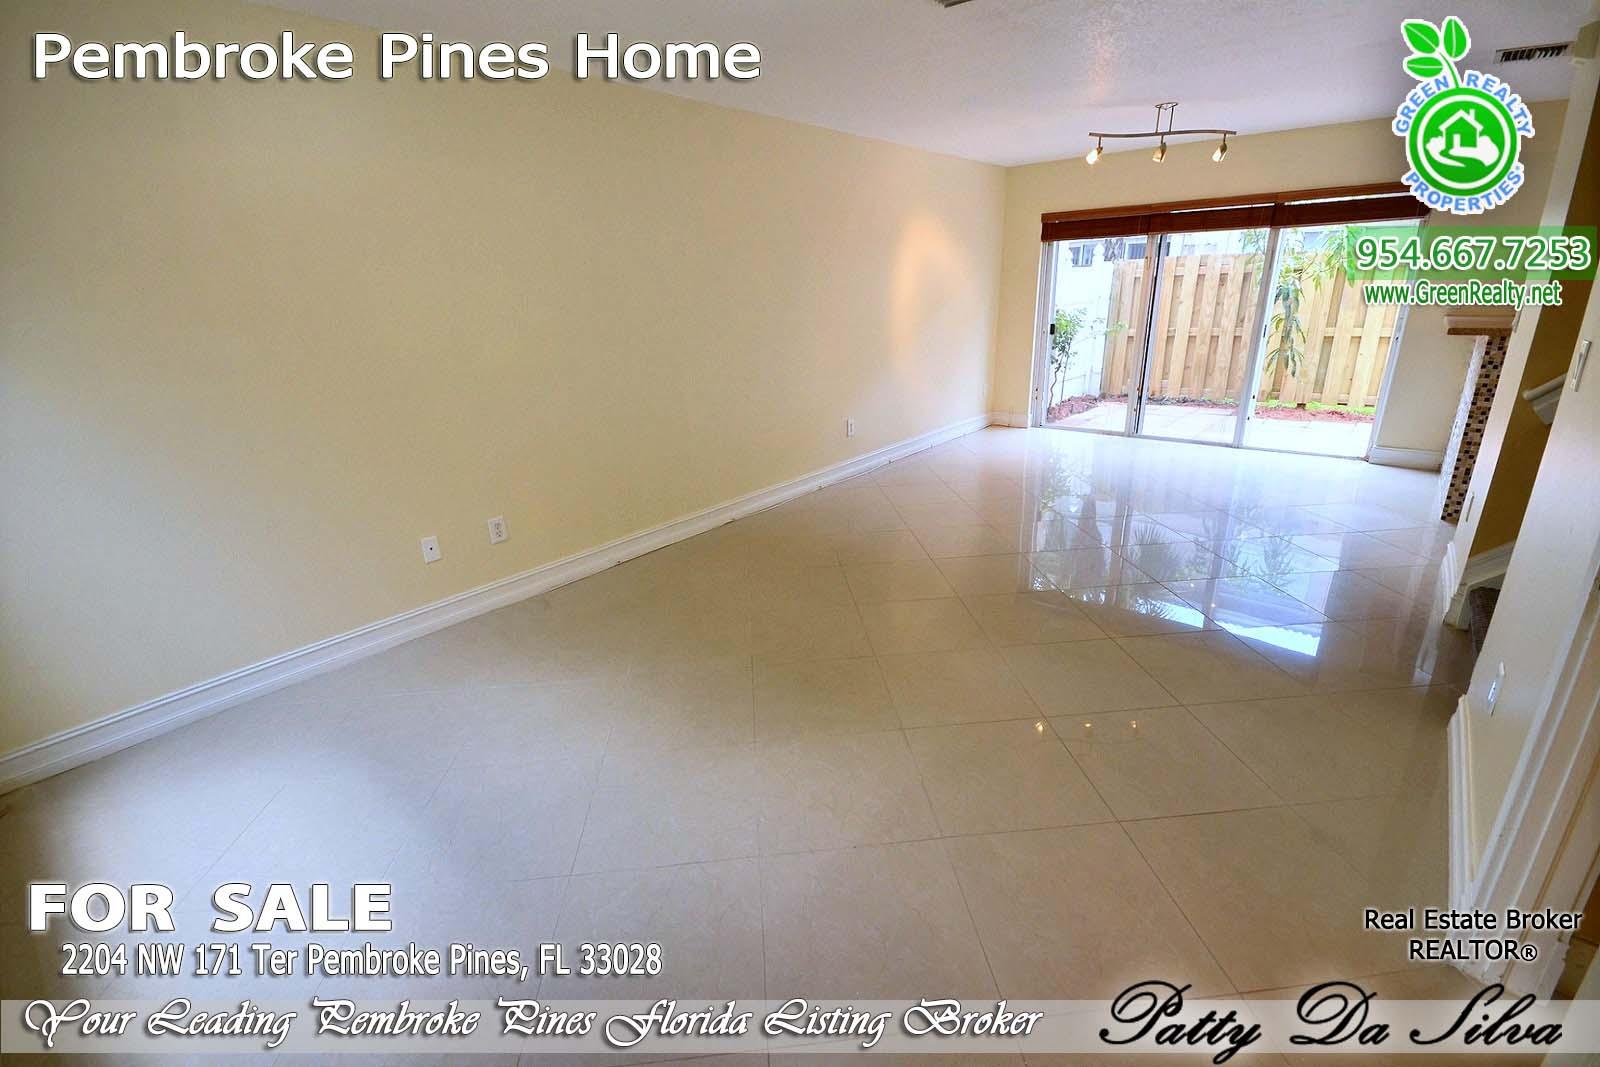 Pembroke Pines Homes For Sale - Pembroke Isles (8)